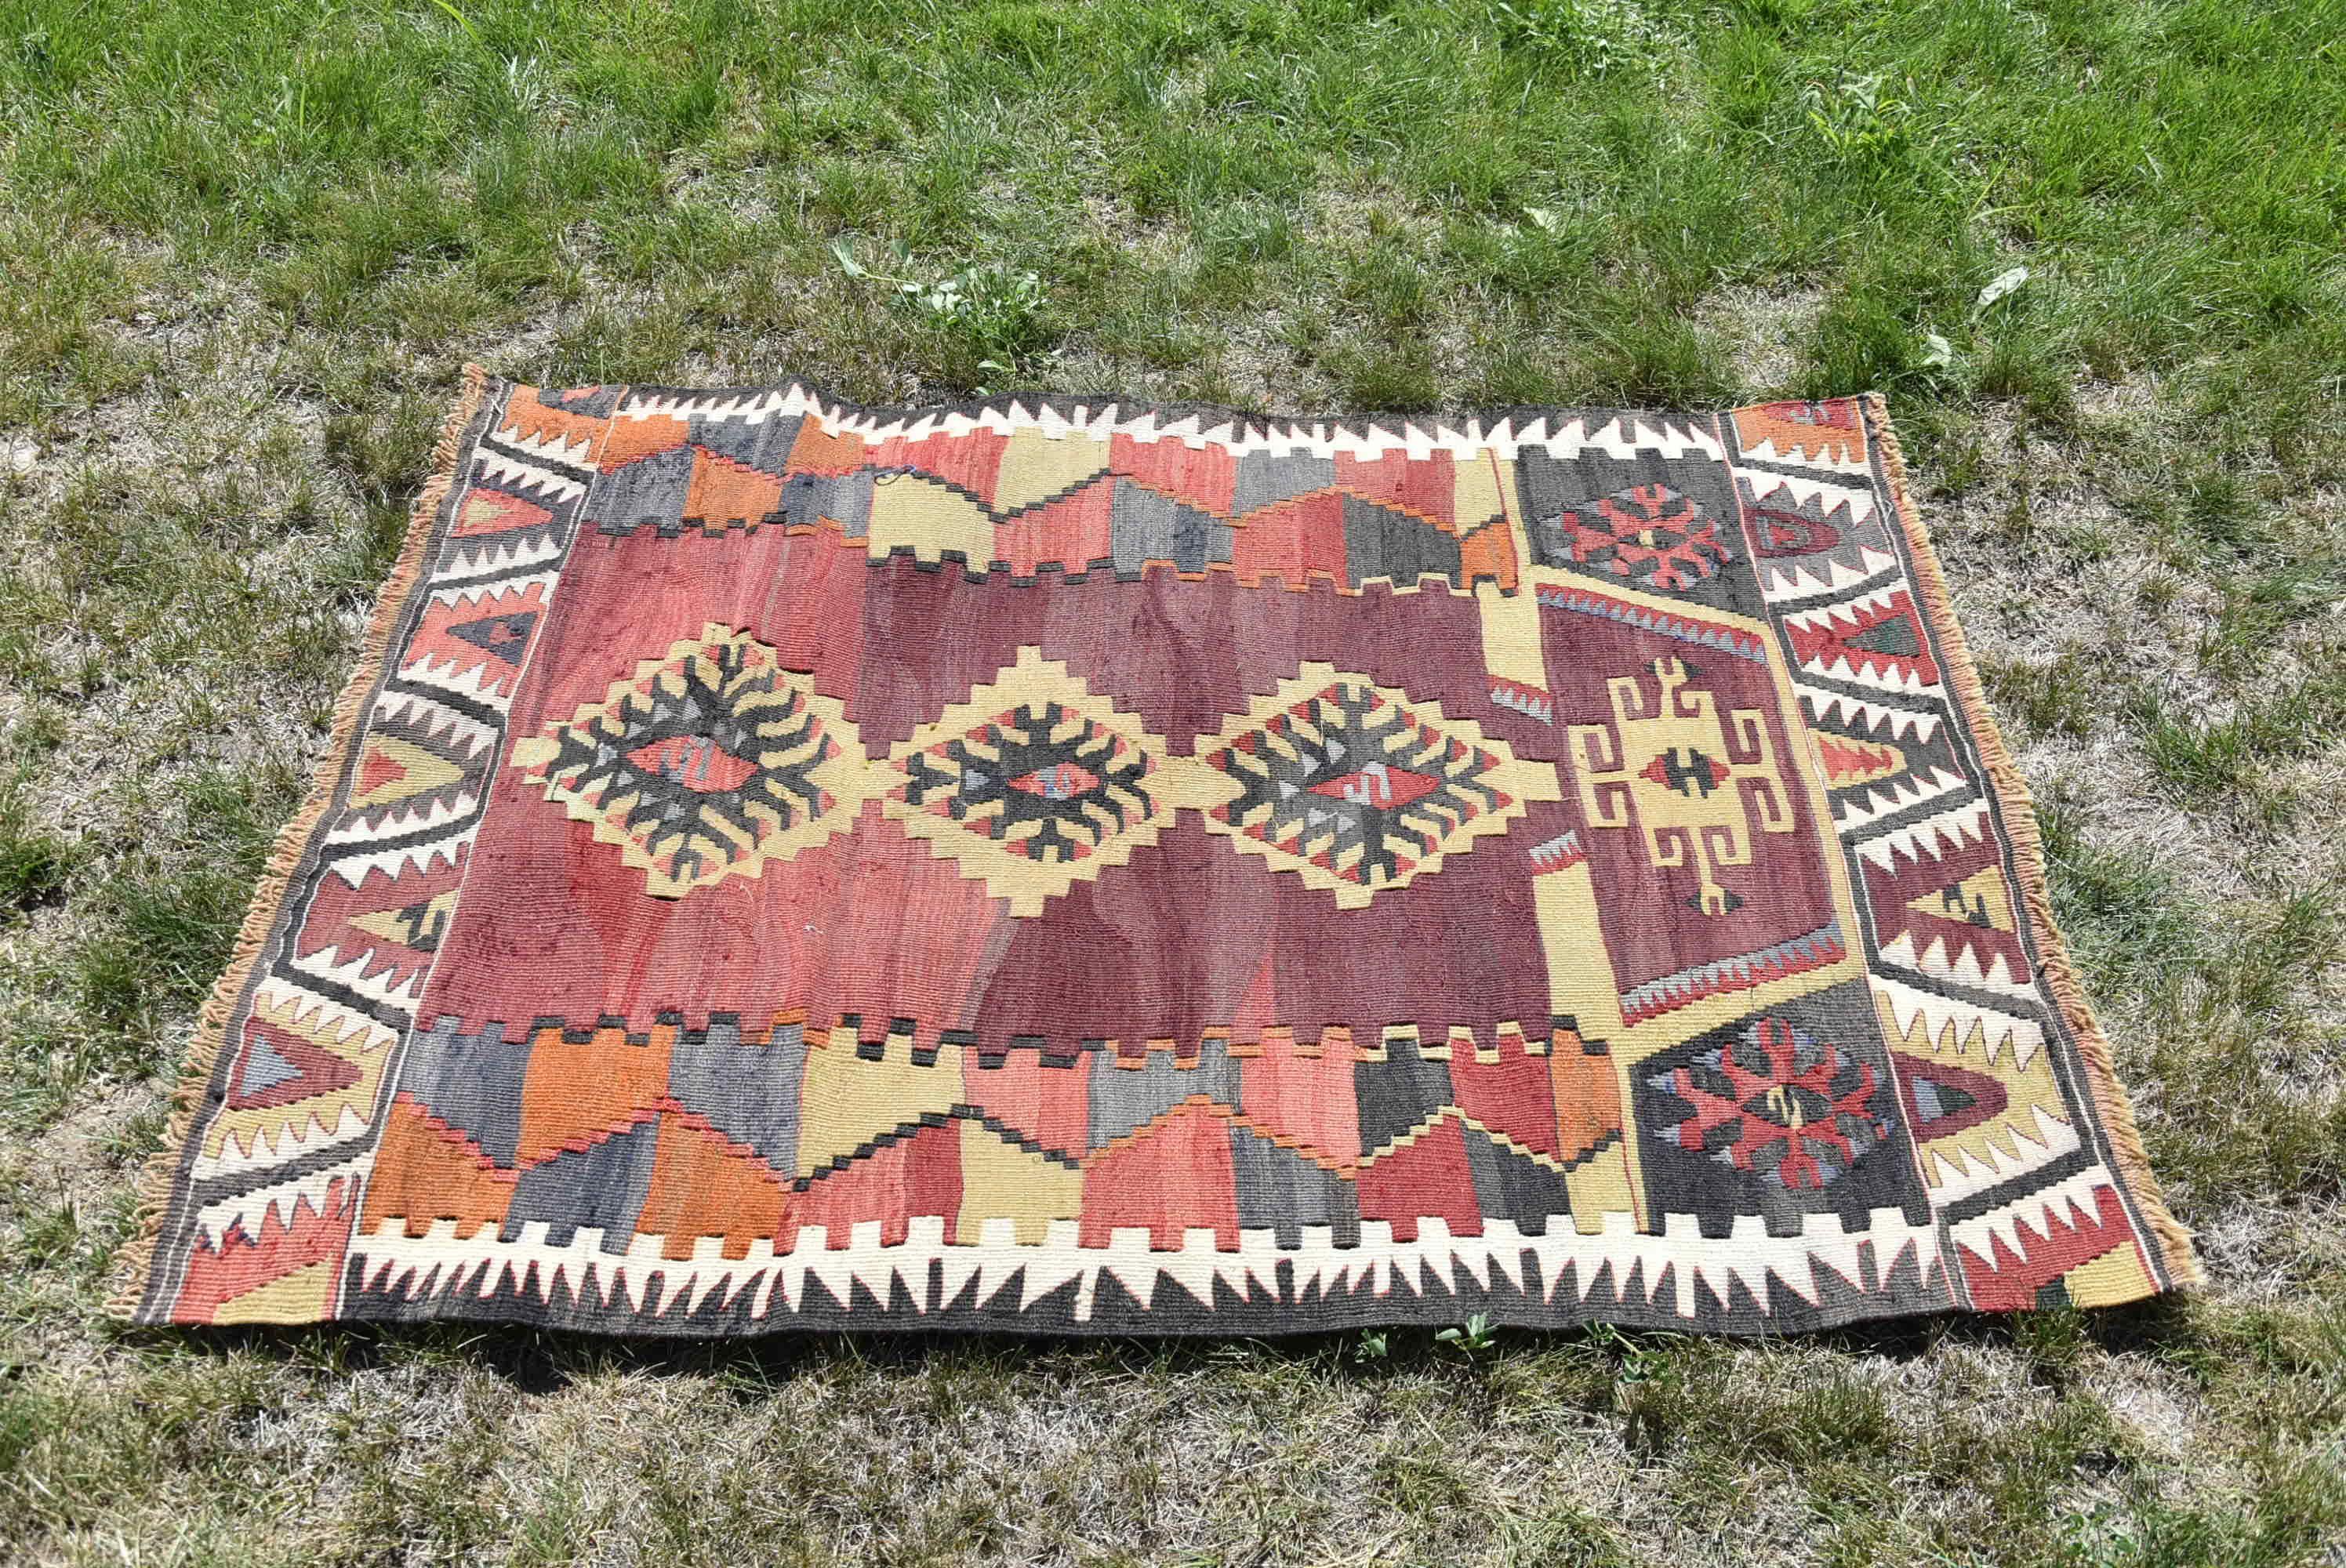 Turkish Kilim Hand Woven Oushak Anatolian Baklava Geometric Style Rug 4x6 feet